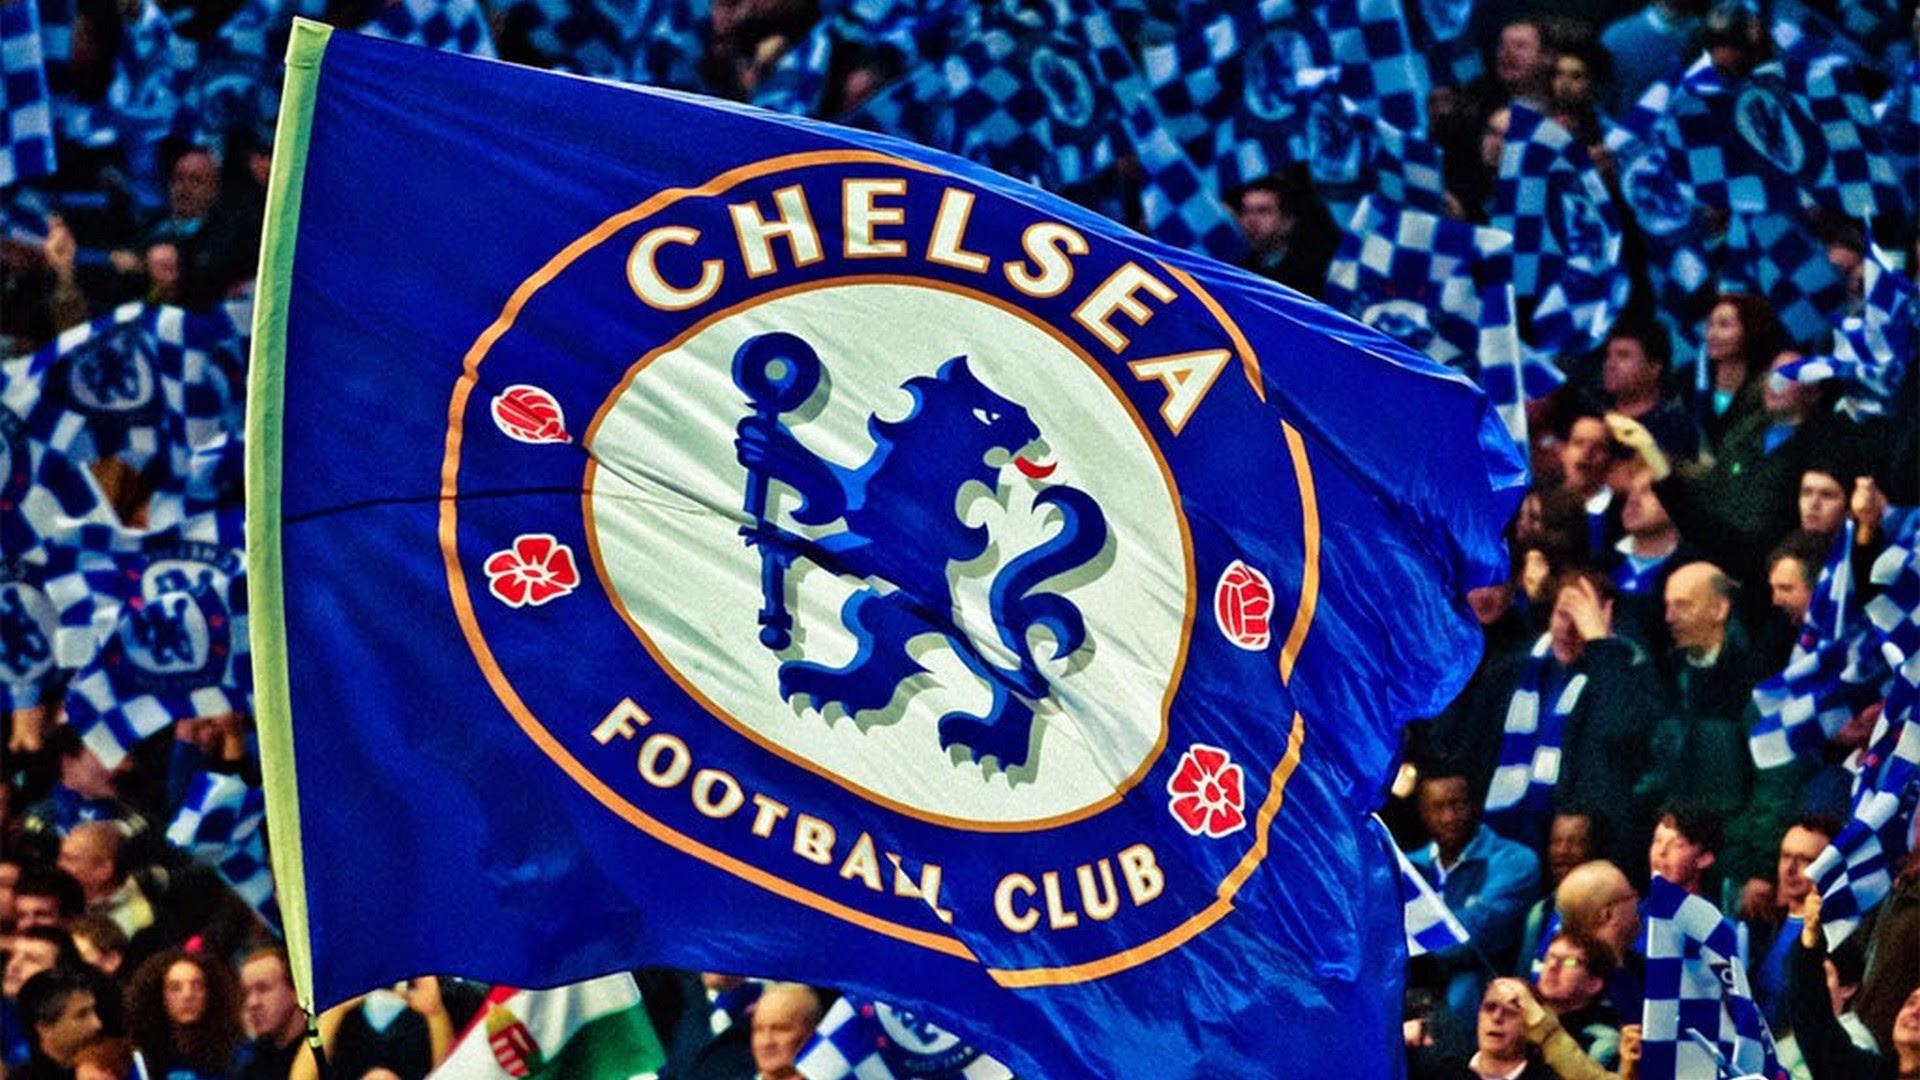 Wallpapers HD Chelsea | 2019 Football Wallpaper